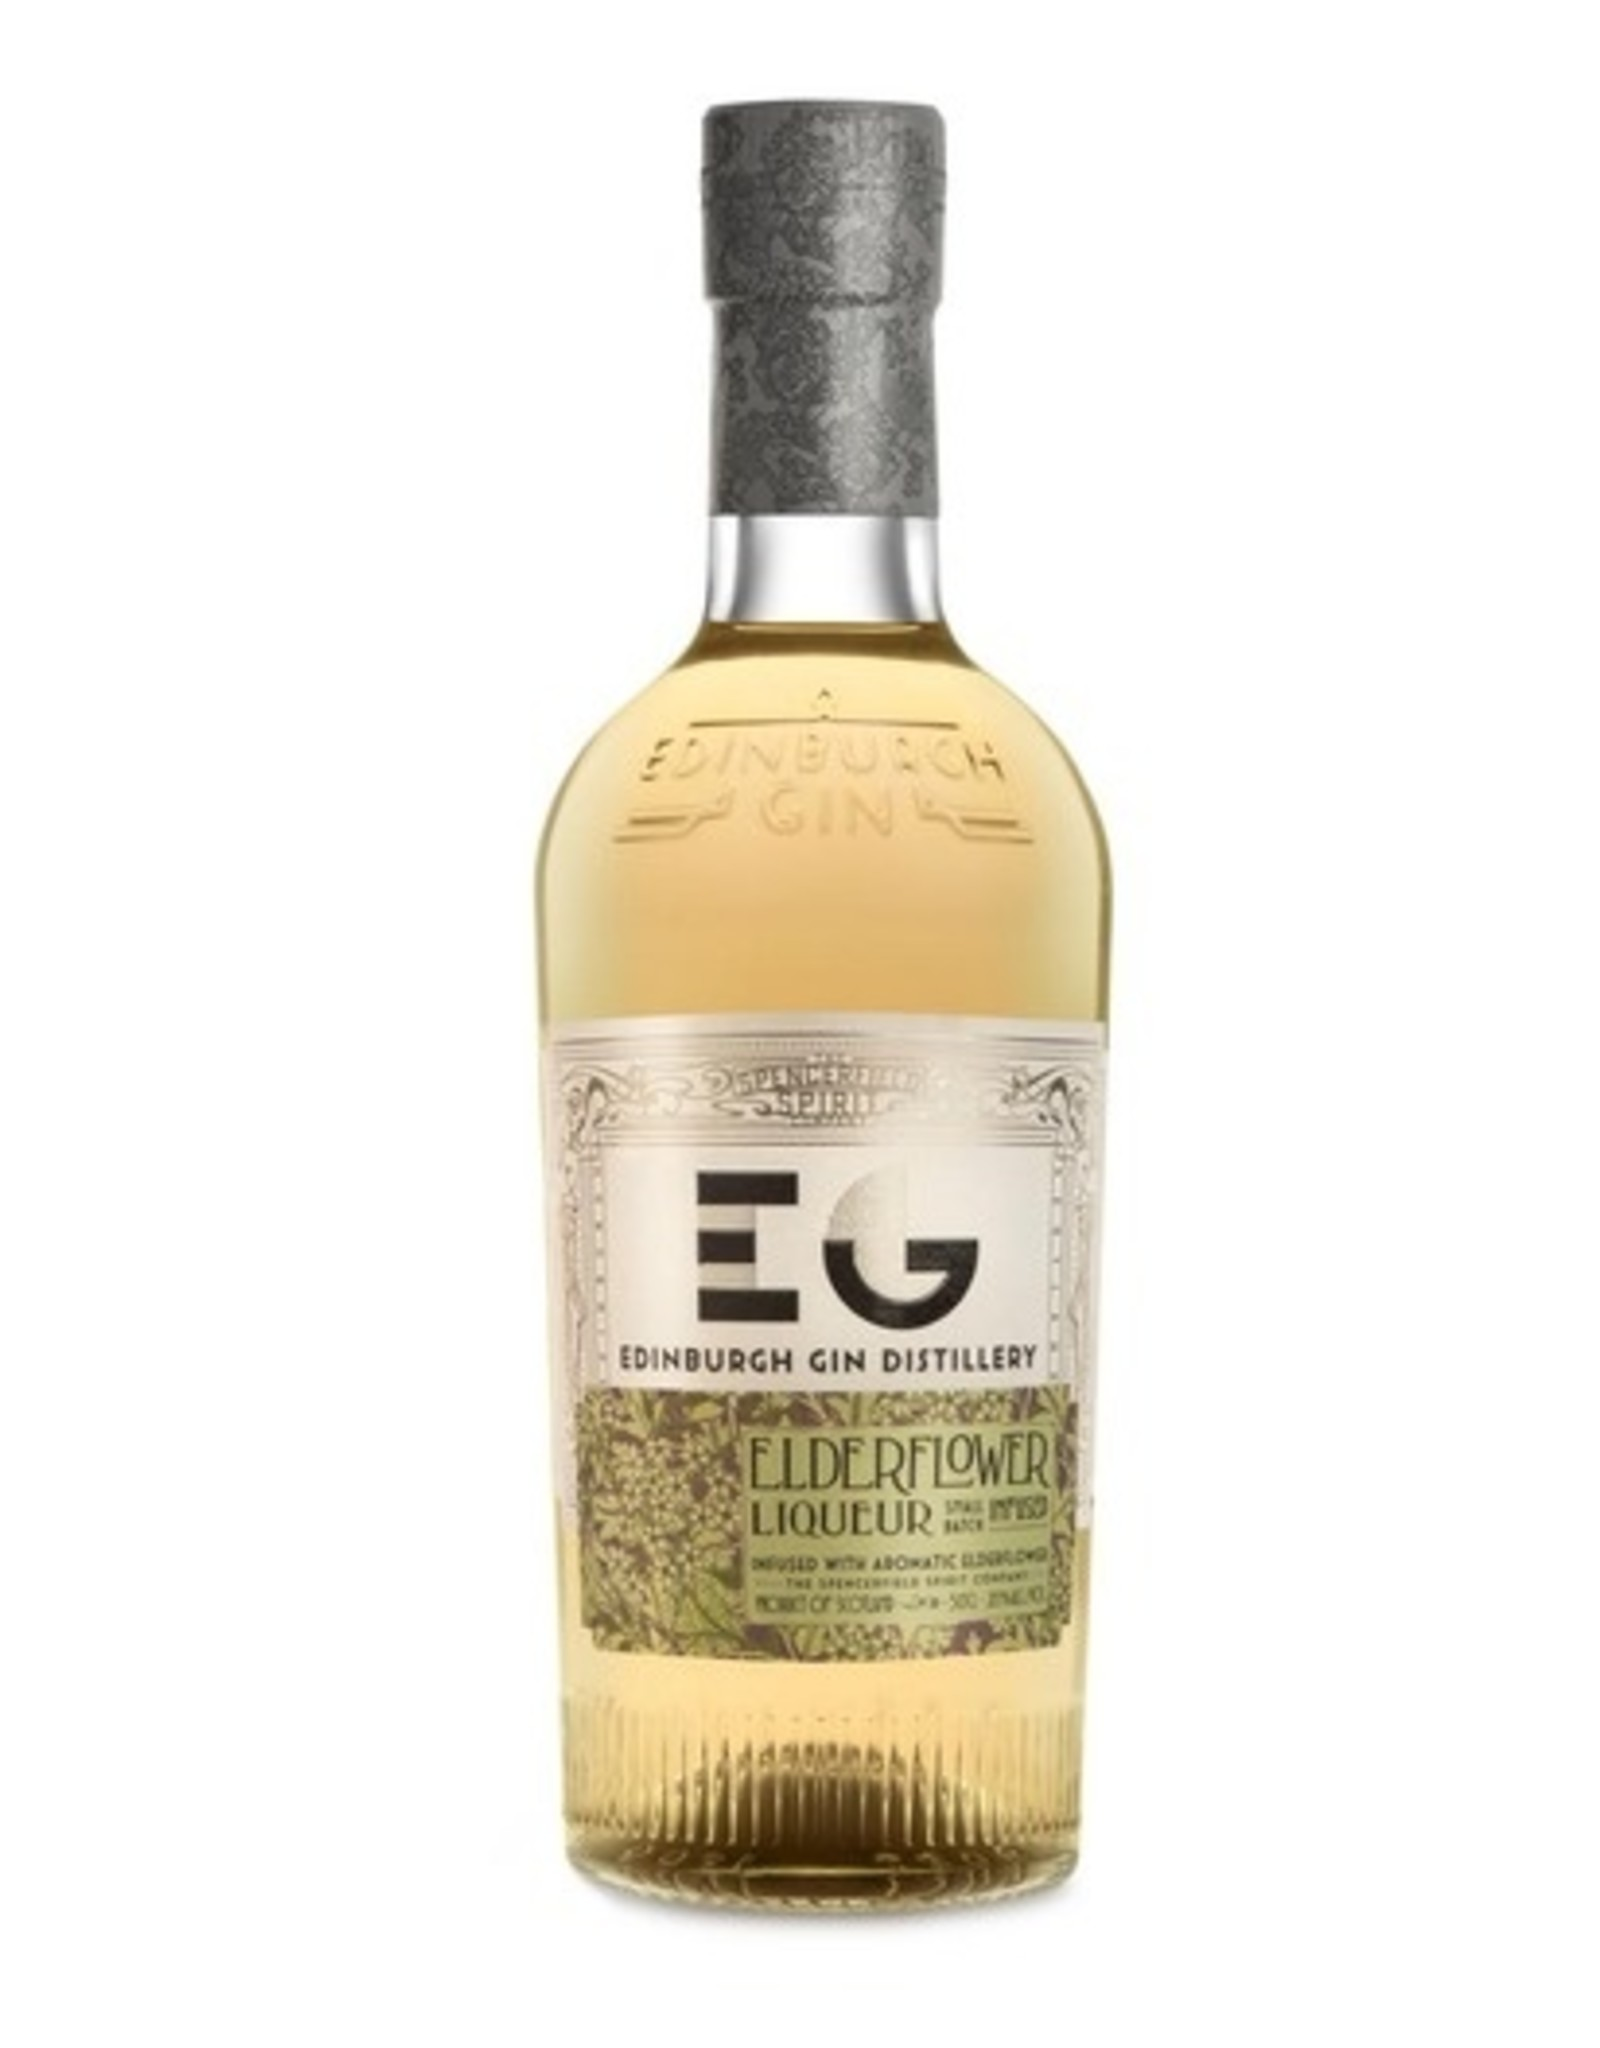 Edinburgh Edinburgh Gin Liquor Elderflower